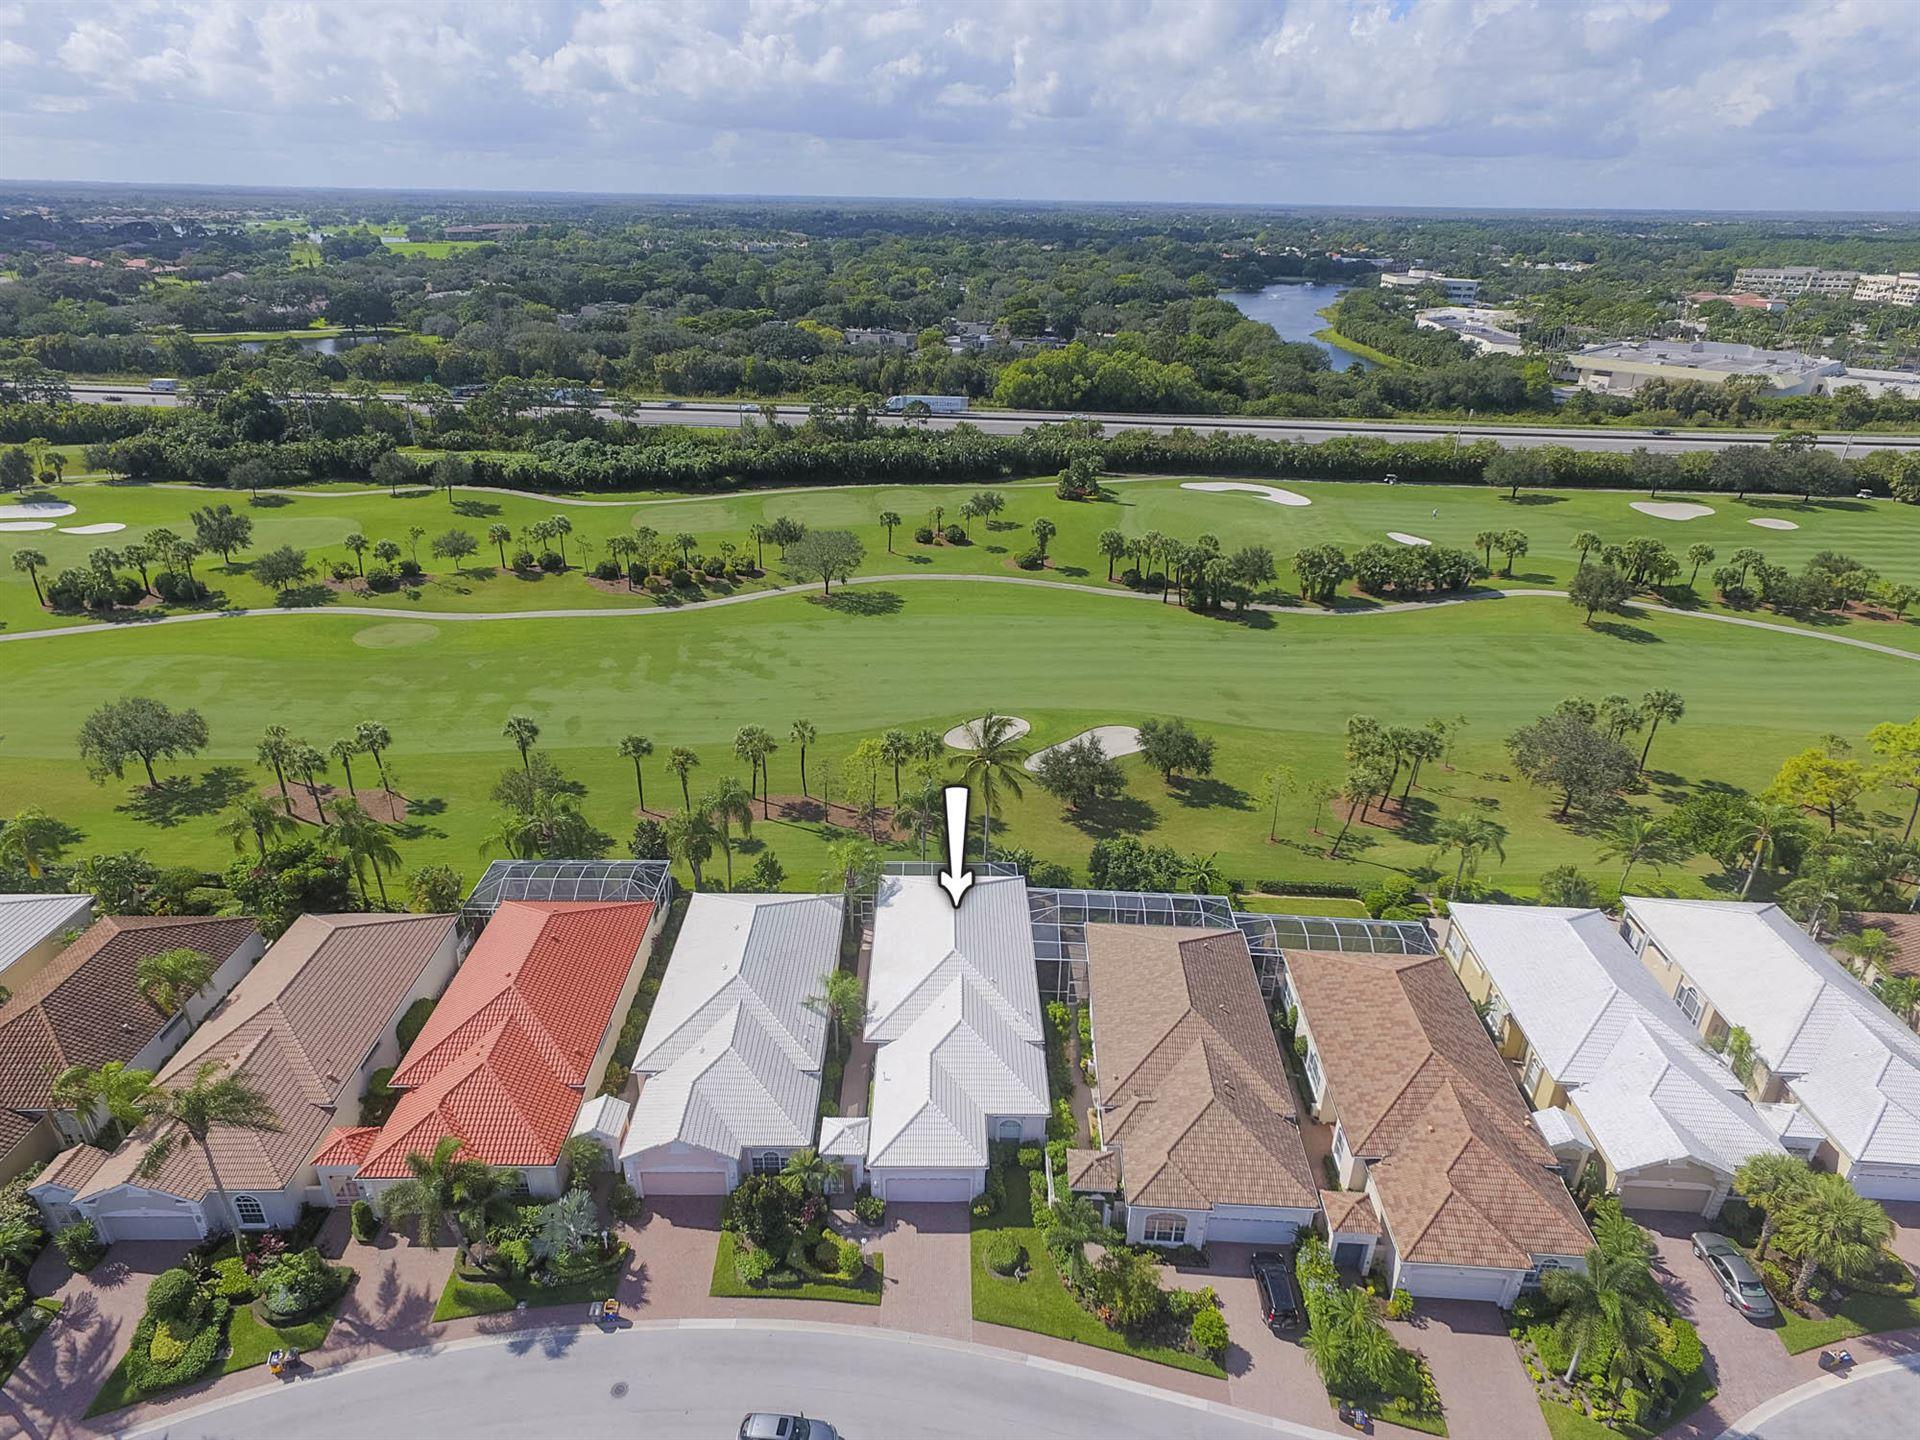 Photo of 130 Coral Cay Drive, Palm Beach Gardens, FL 33418 (MLS # RX-10665170)